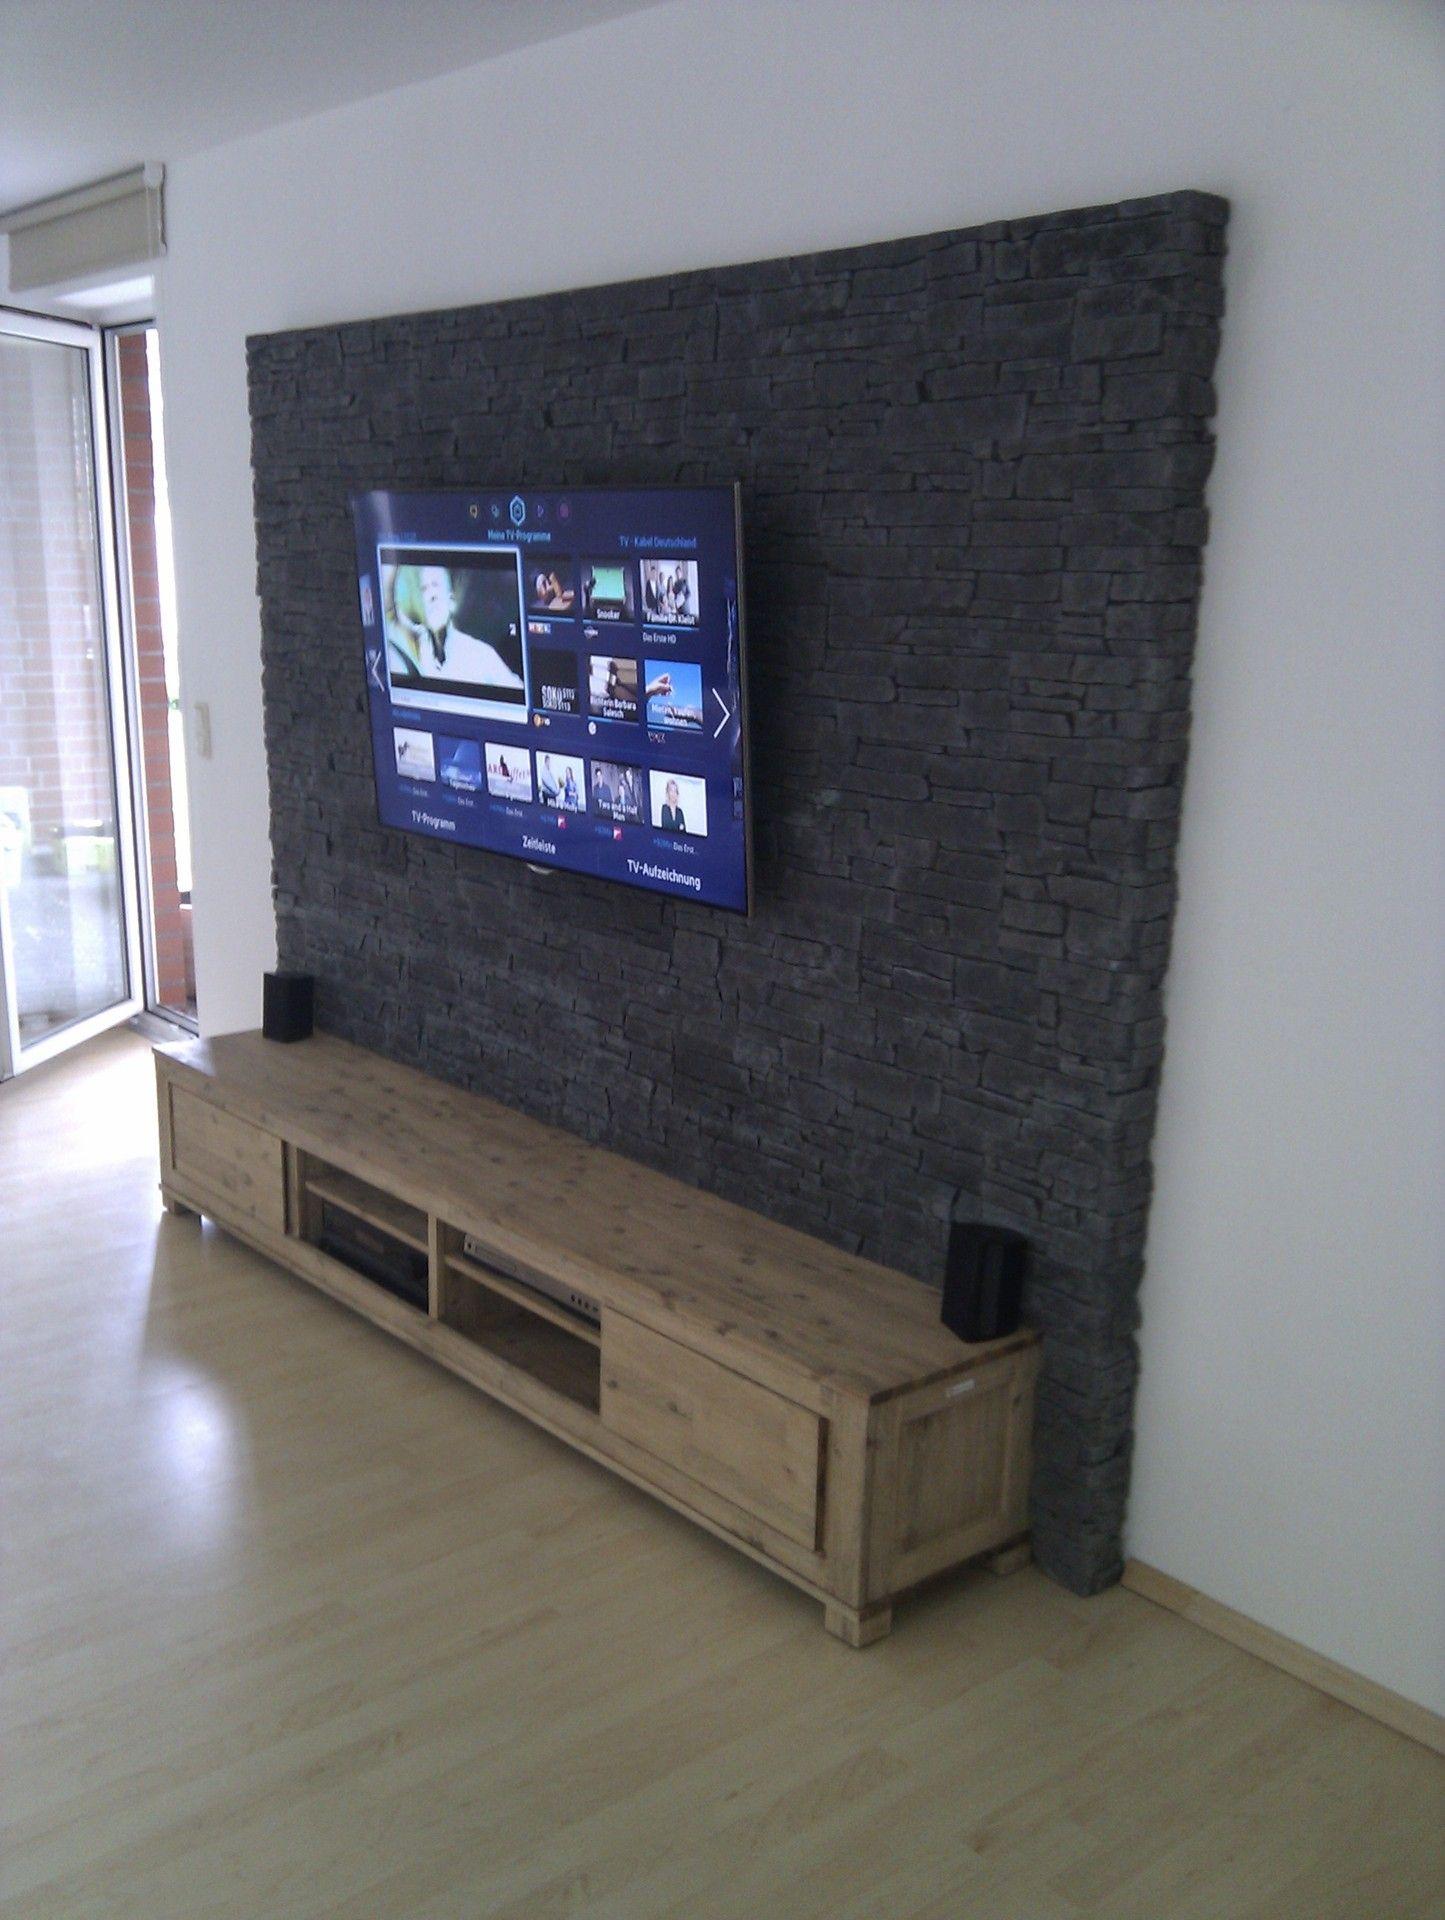 steinwand mediawand eigenbau eigenbau mediawand offtopic steinwand steinwandmultimedia. Black Bedroom Furniture Sets. Home Design Ideas